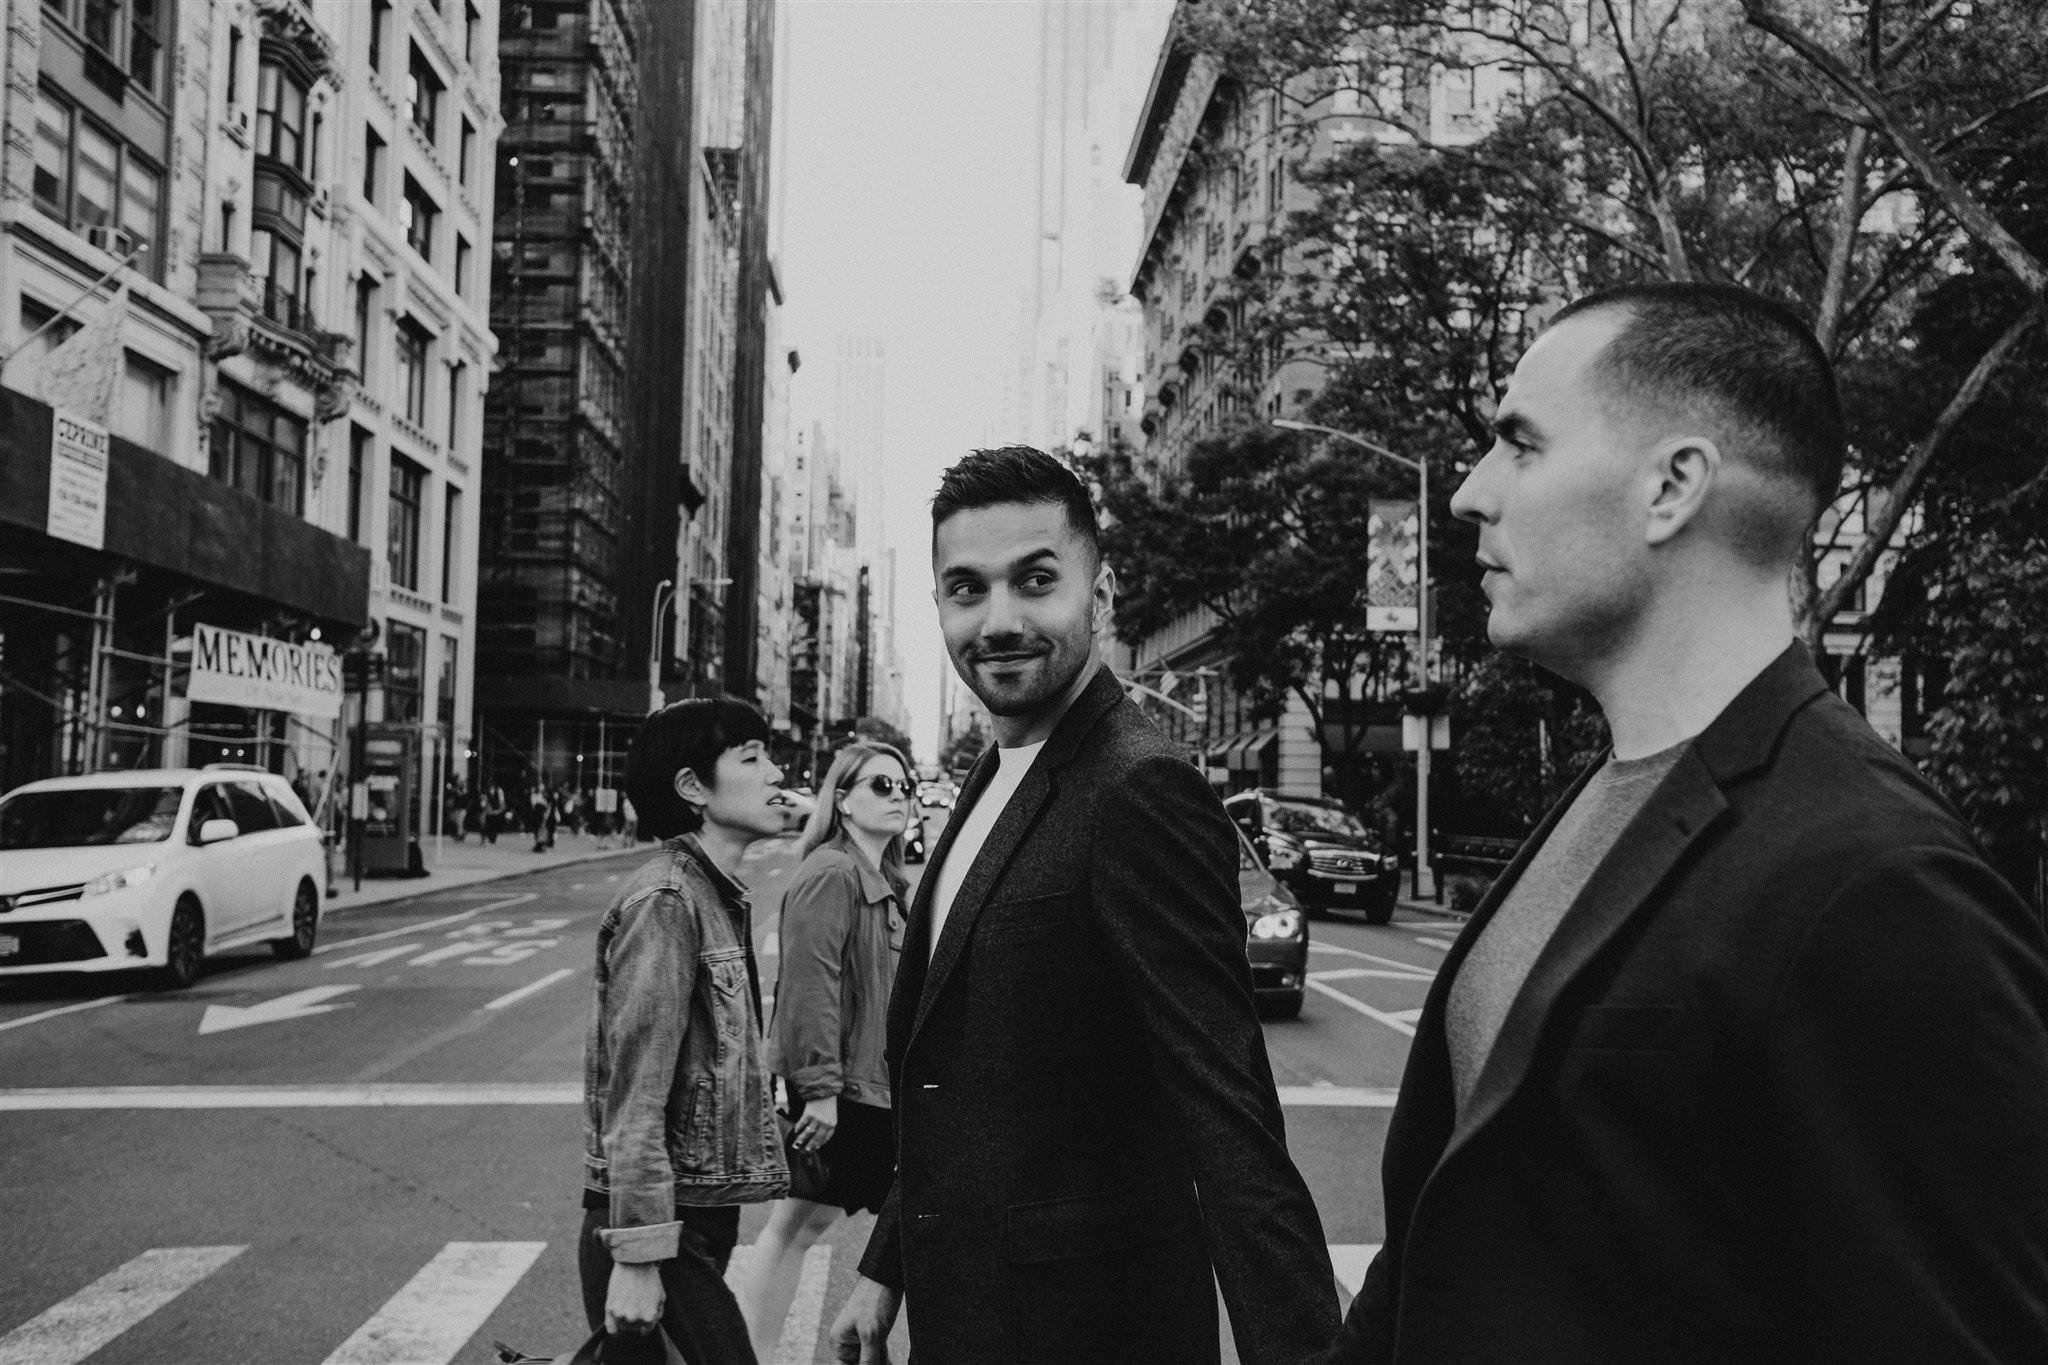 lbgtq-gay-wedding-elopement-photography-chellise-michael-photography282.JPG